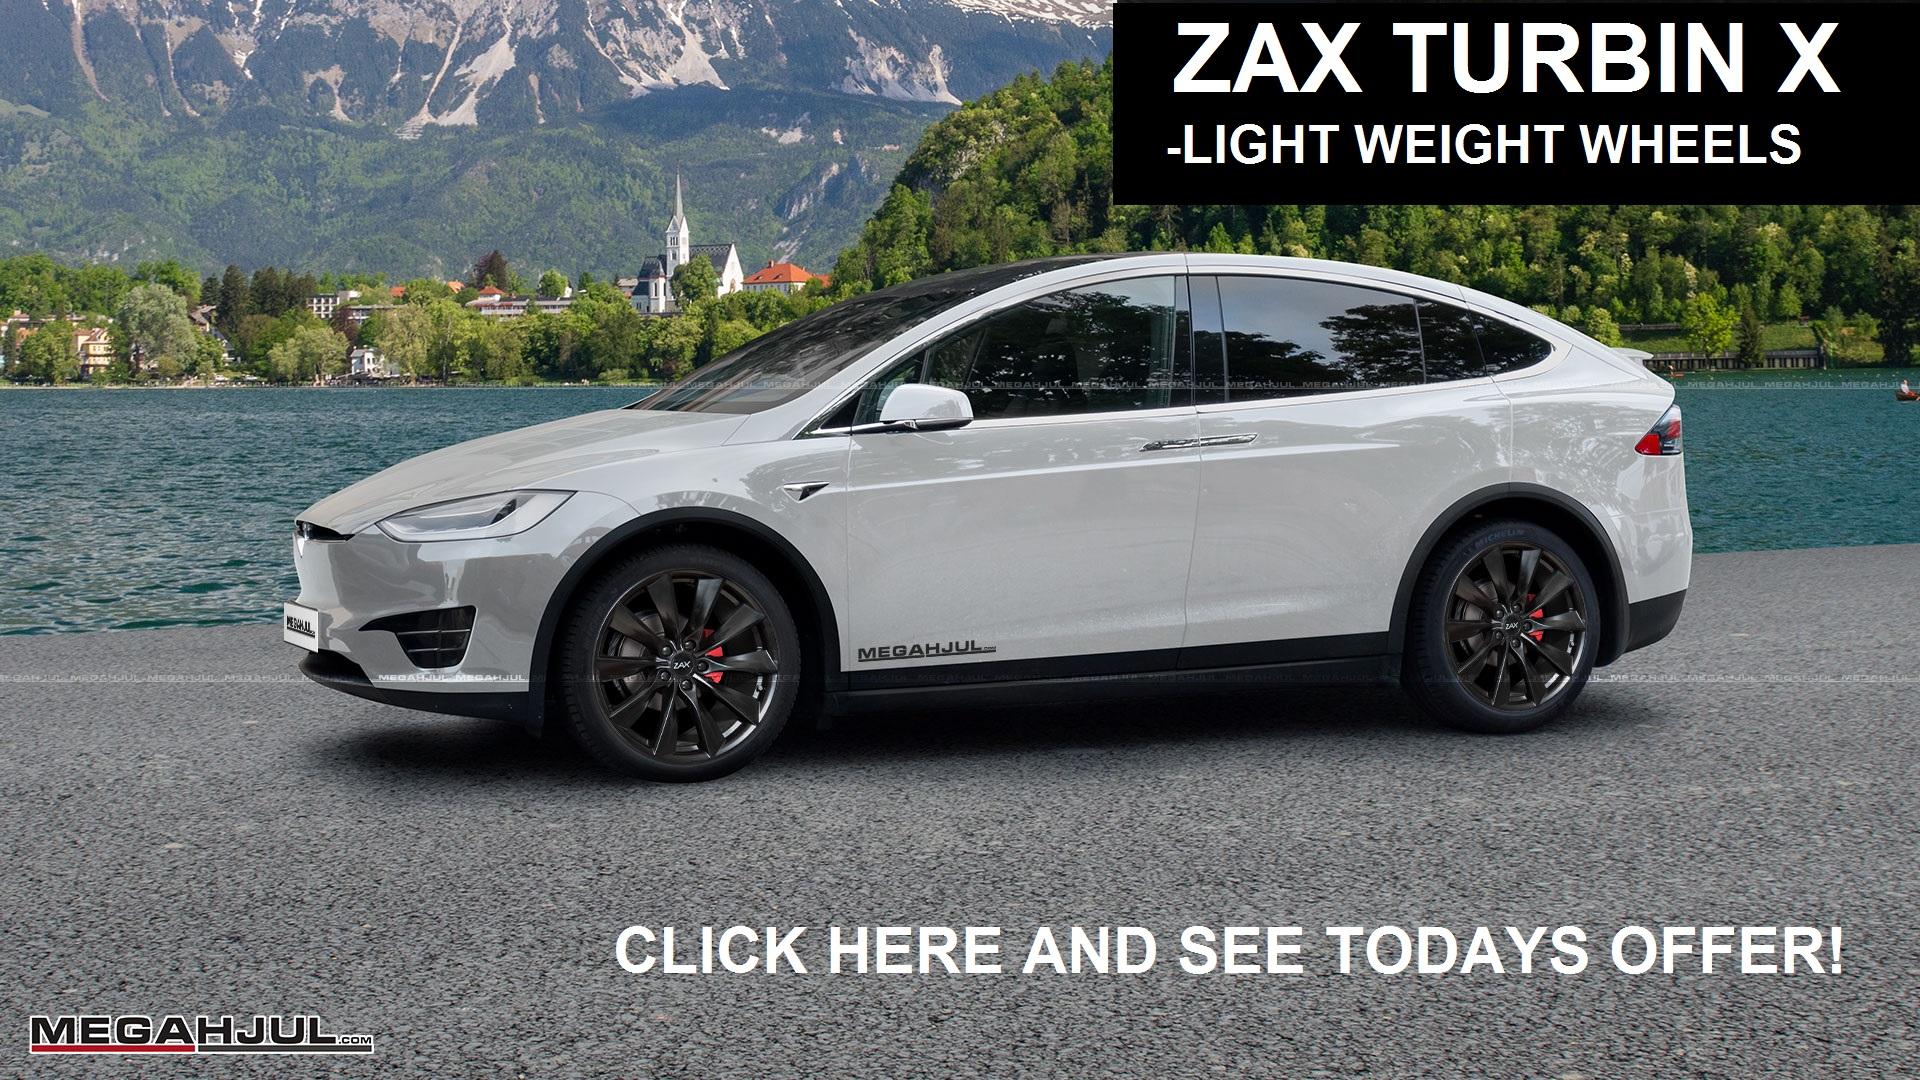 Tesla-model-x-wheels-black-felger-sorte-zax-turbin-x